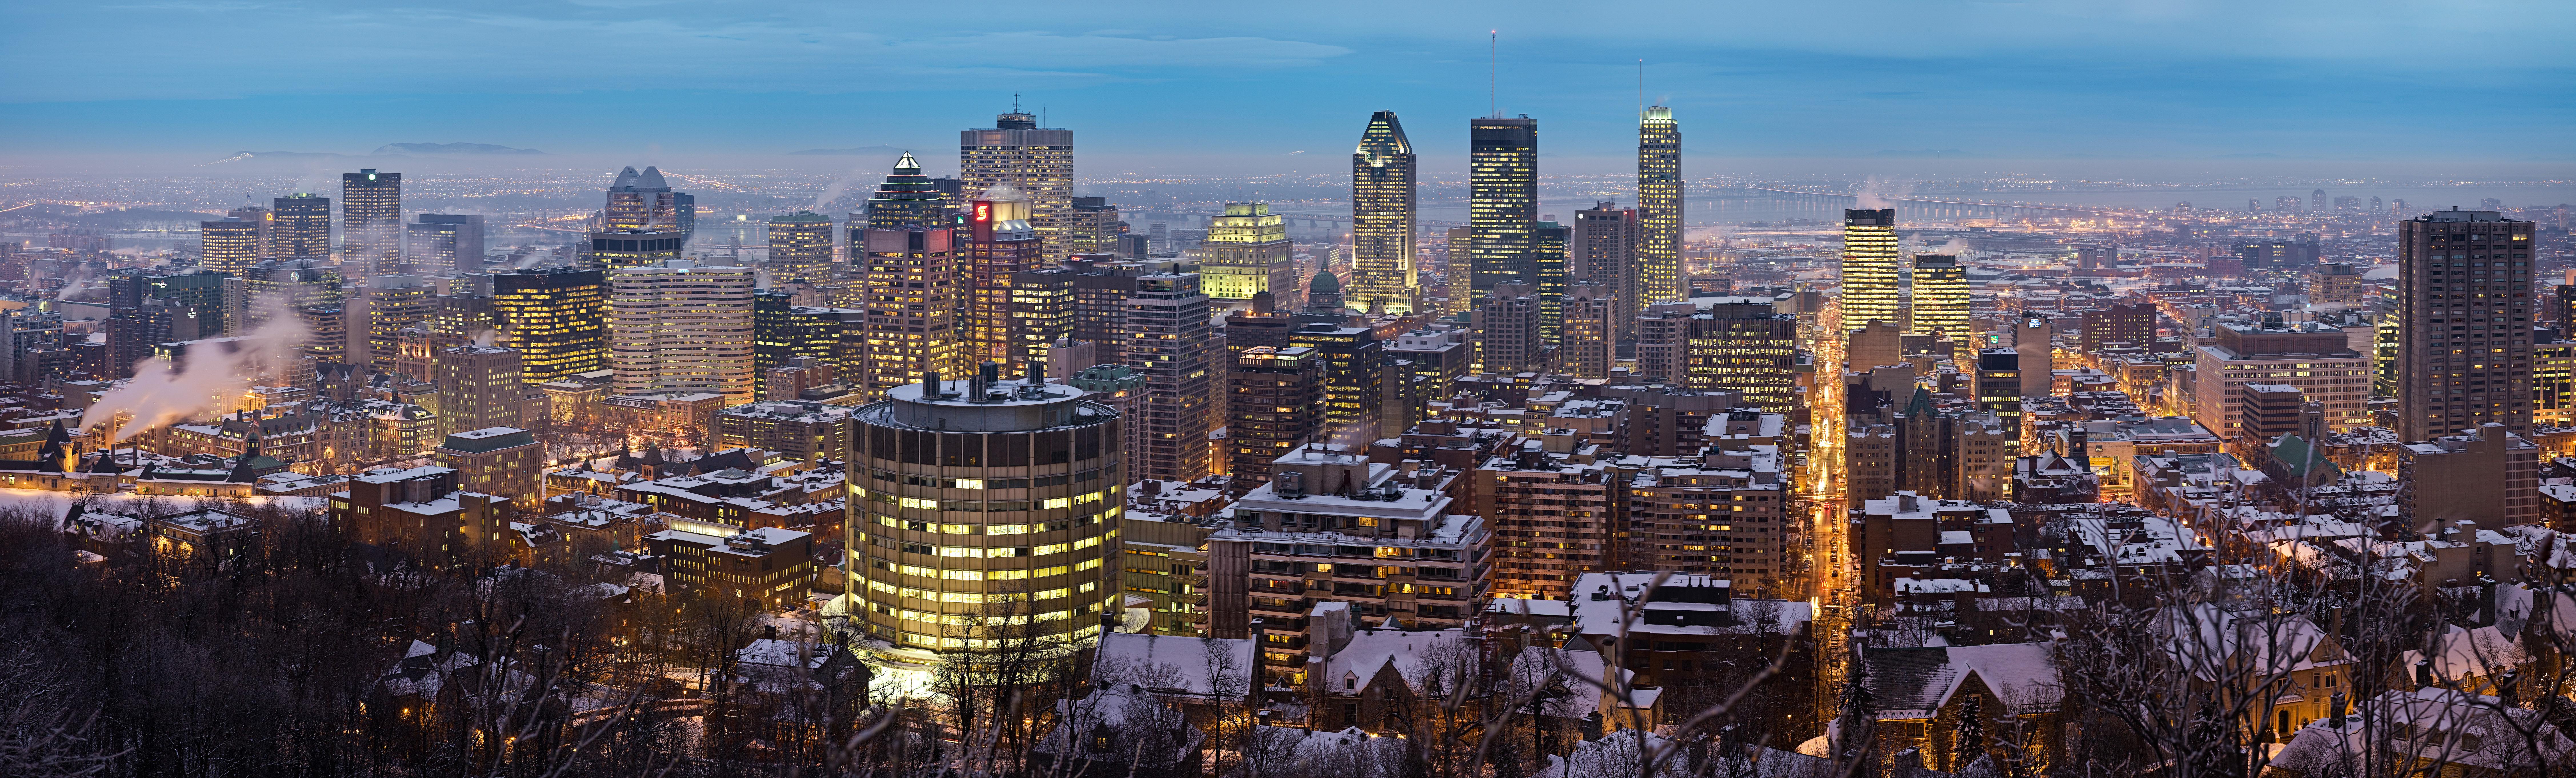 Montreal_Twilight_Panorama_2006.jpg